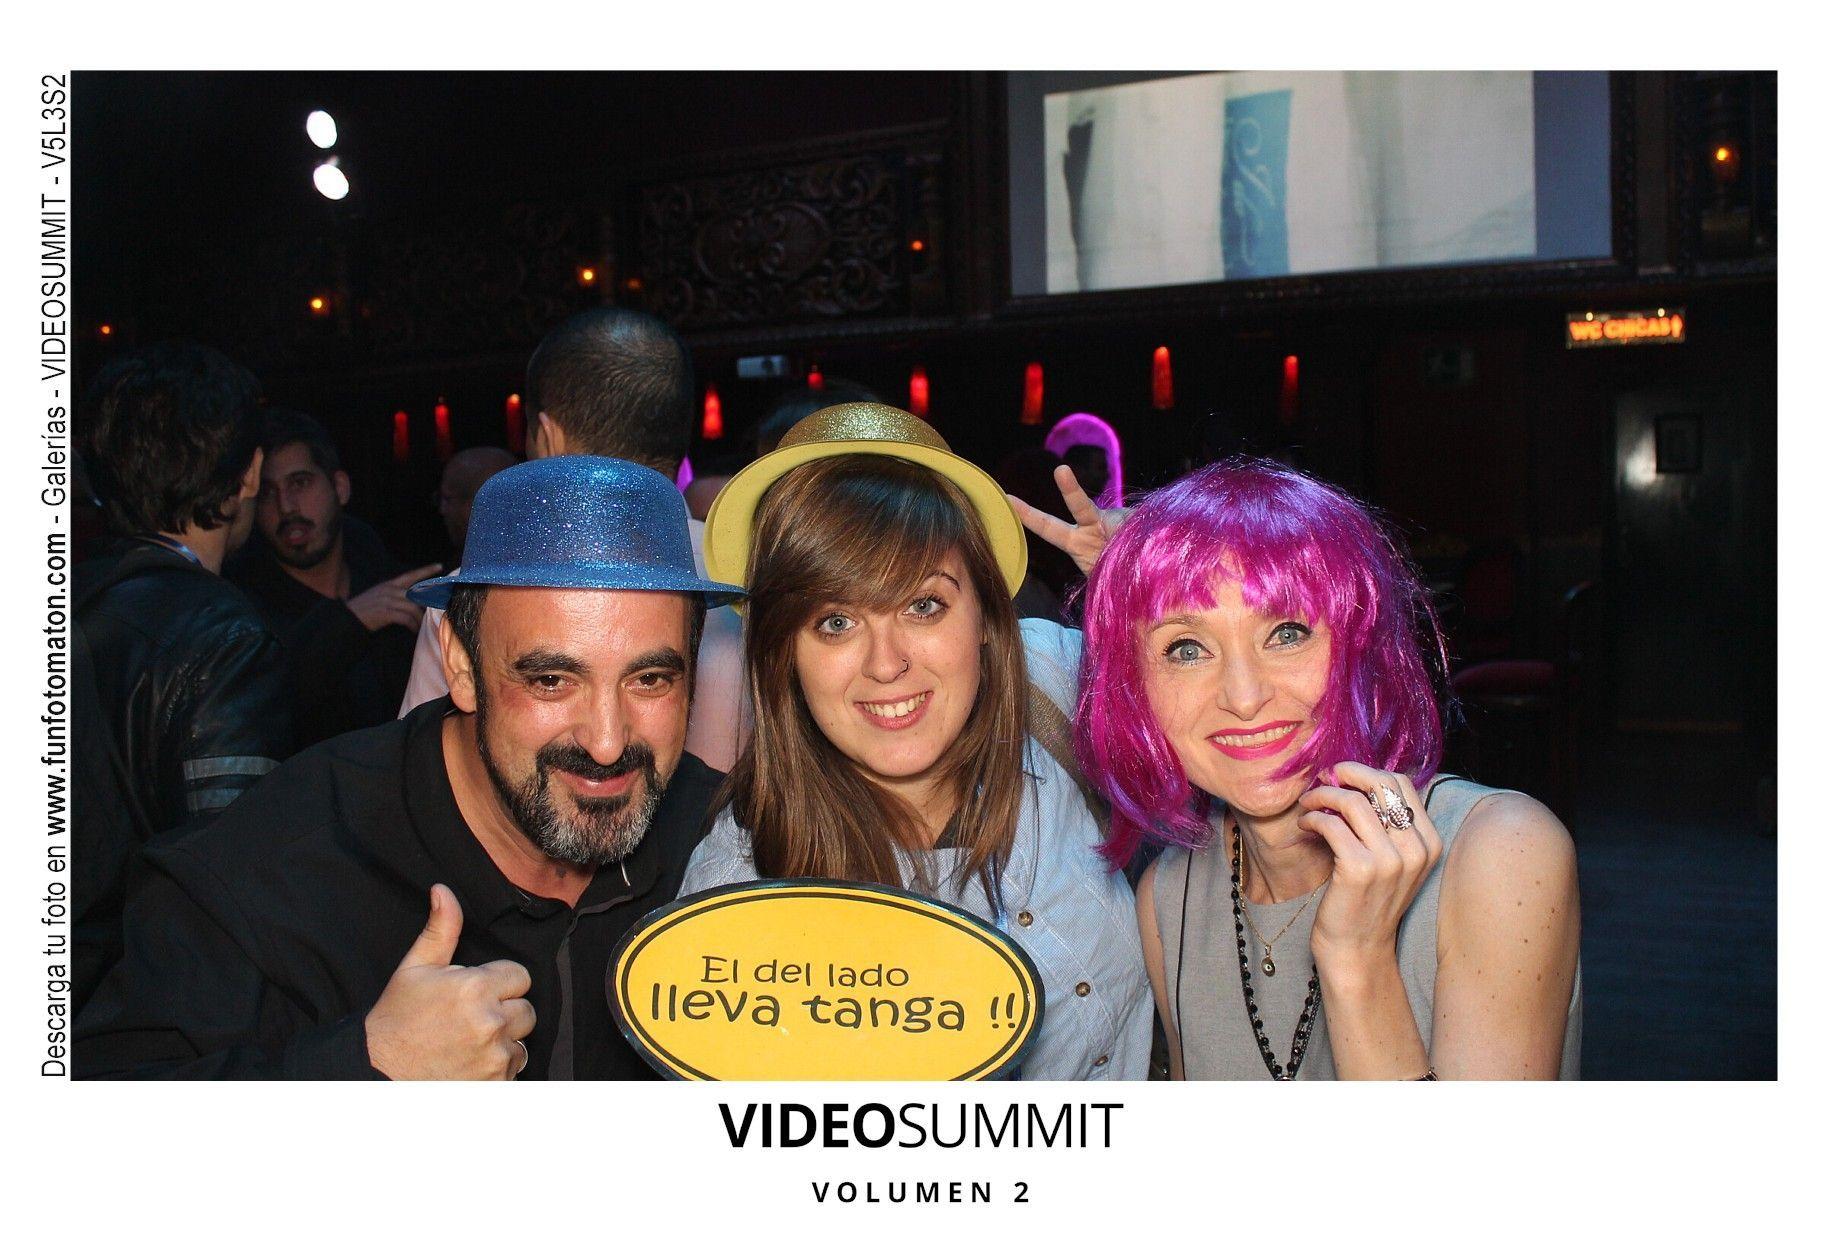 videosummit-vol2-club-party-071